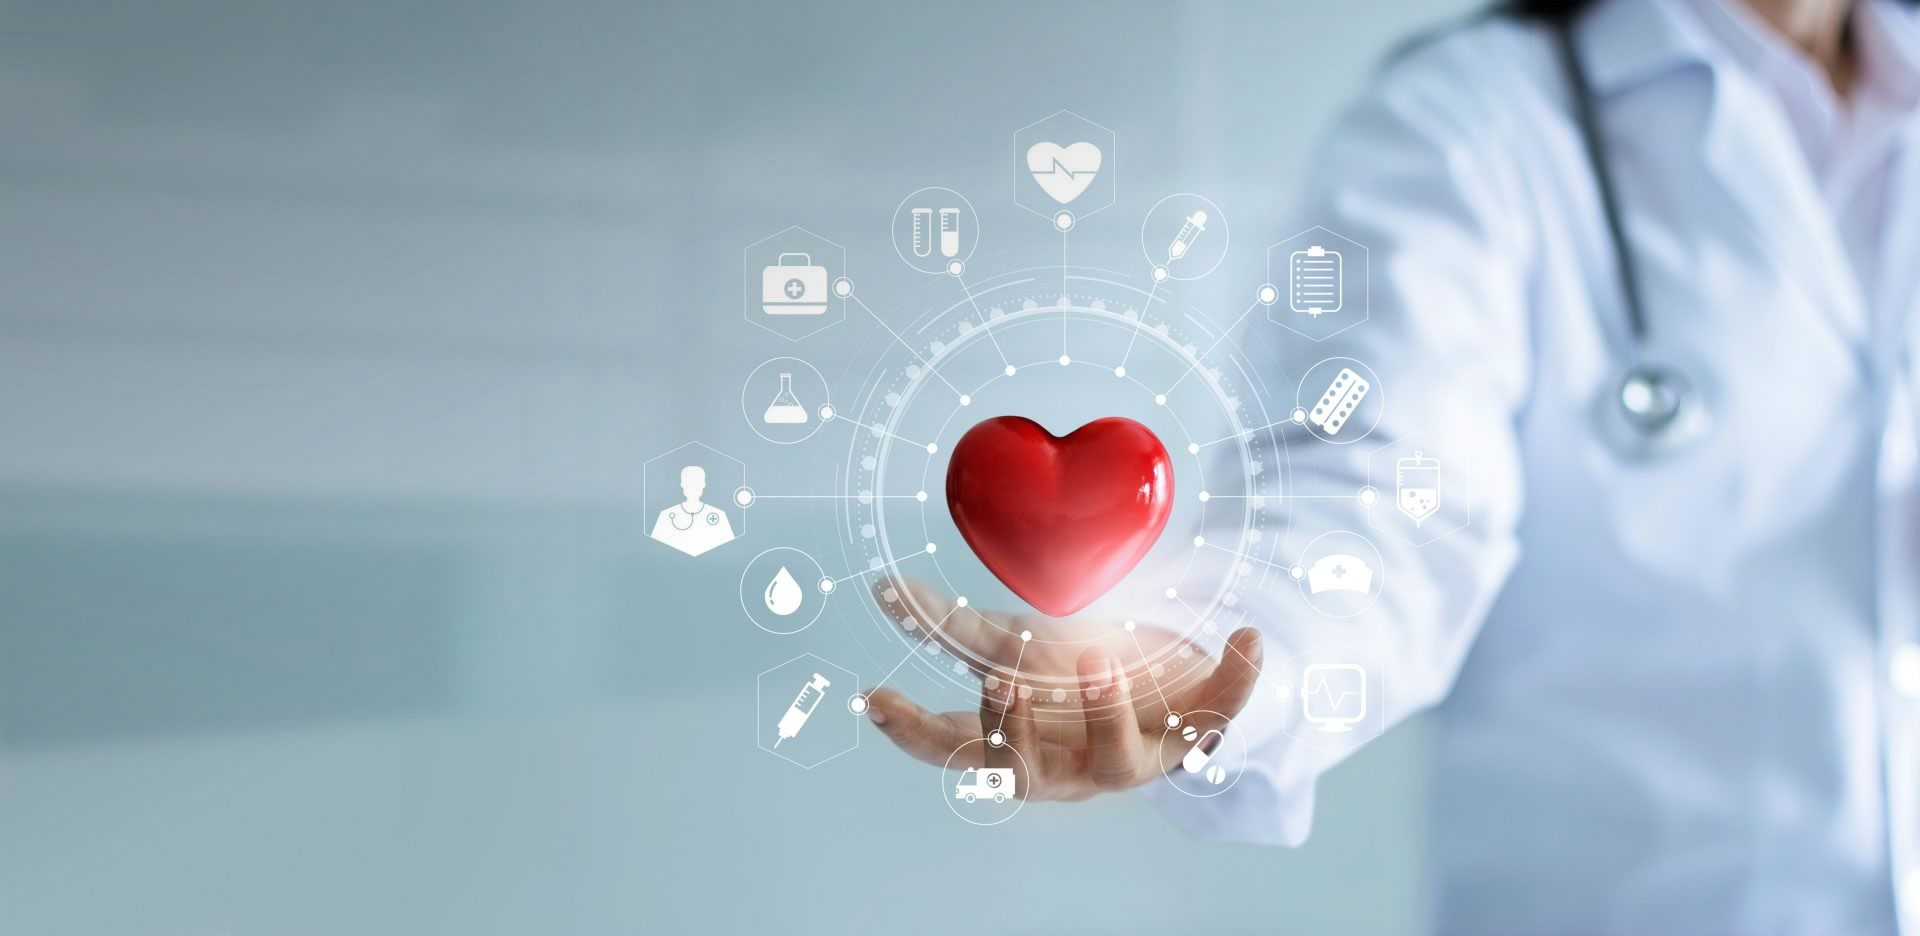 Point-of-Care Diagnostics